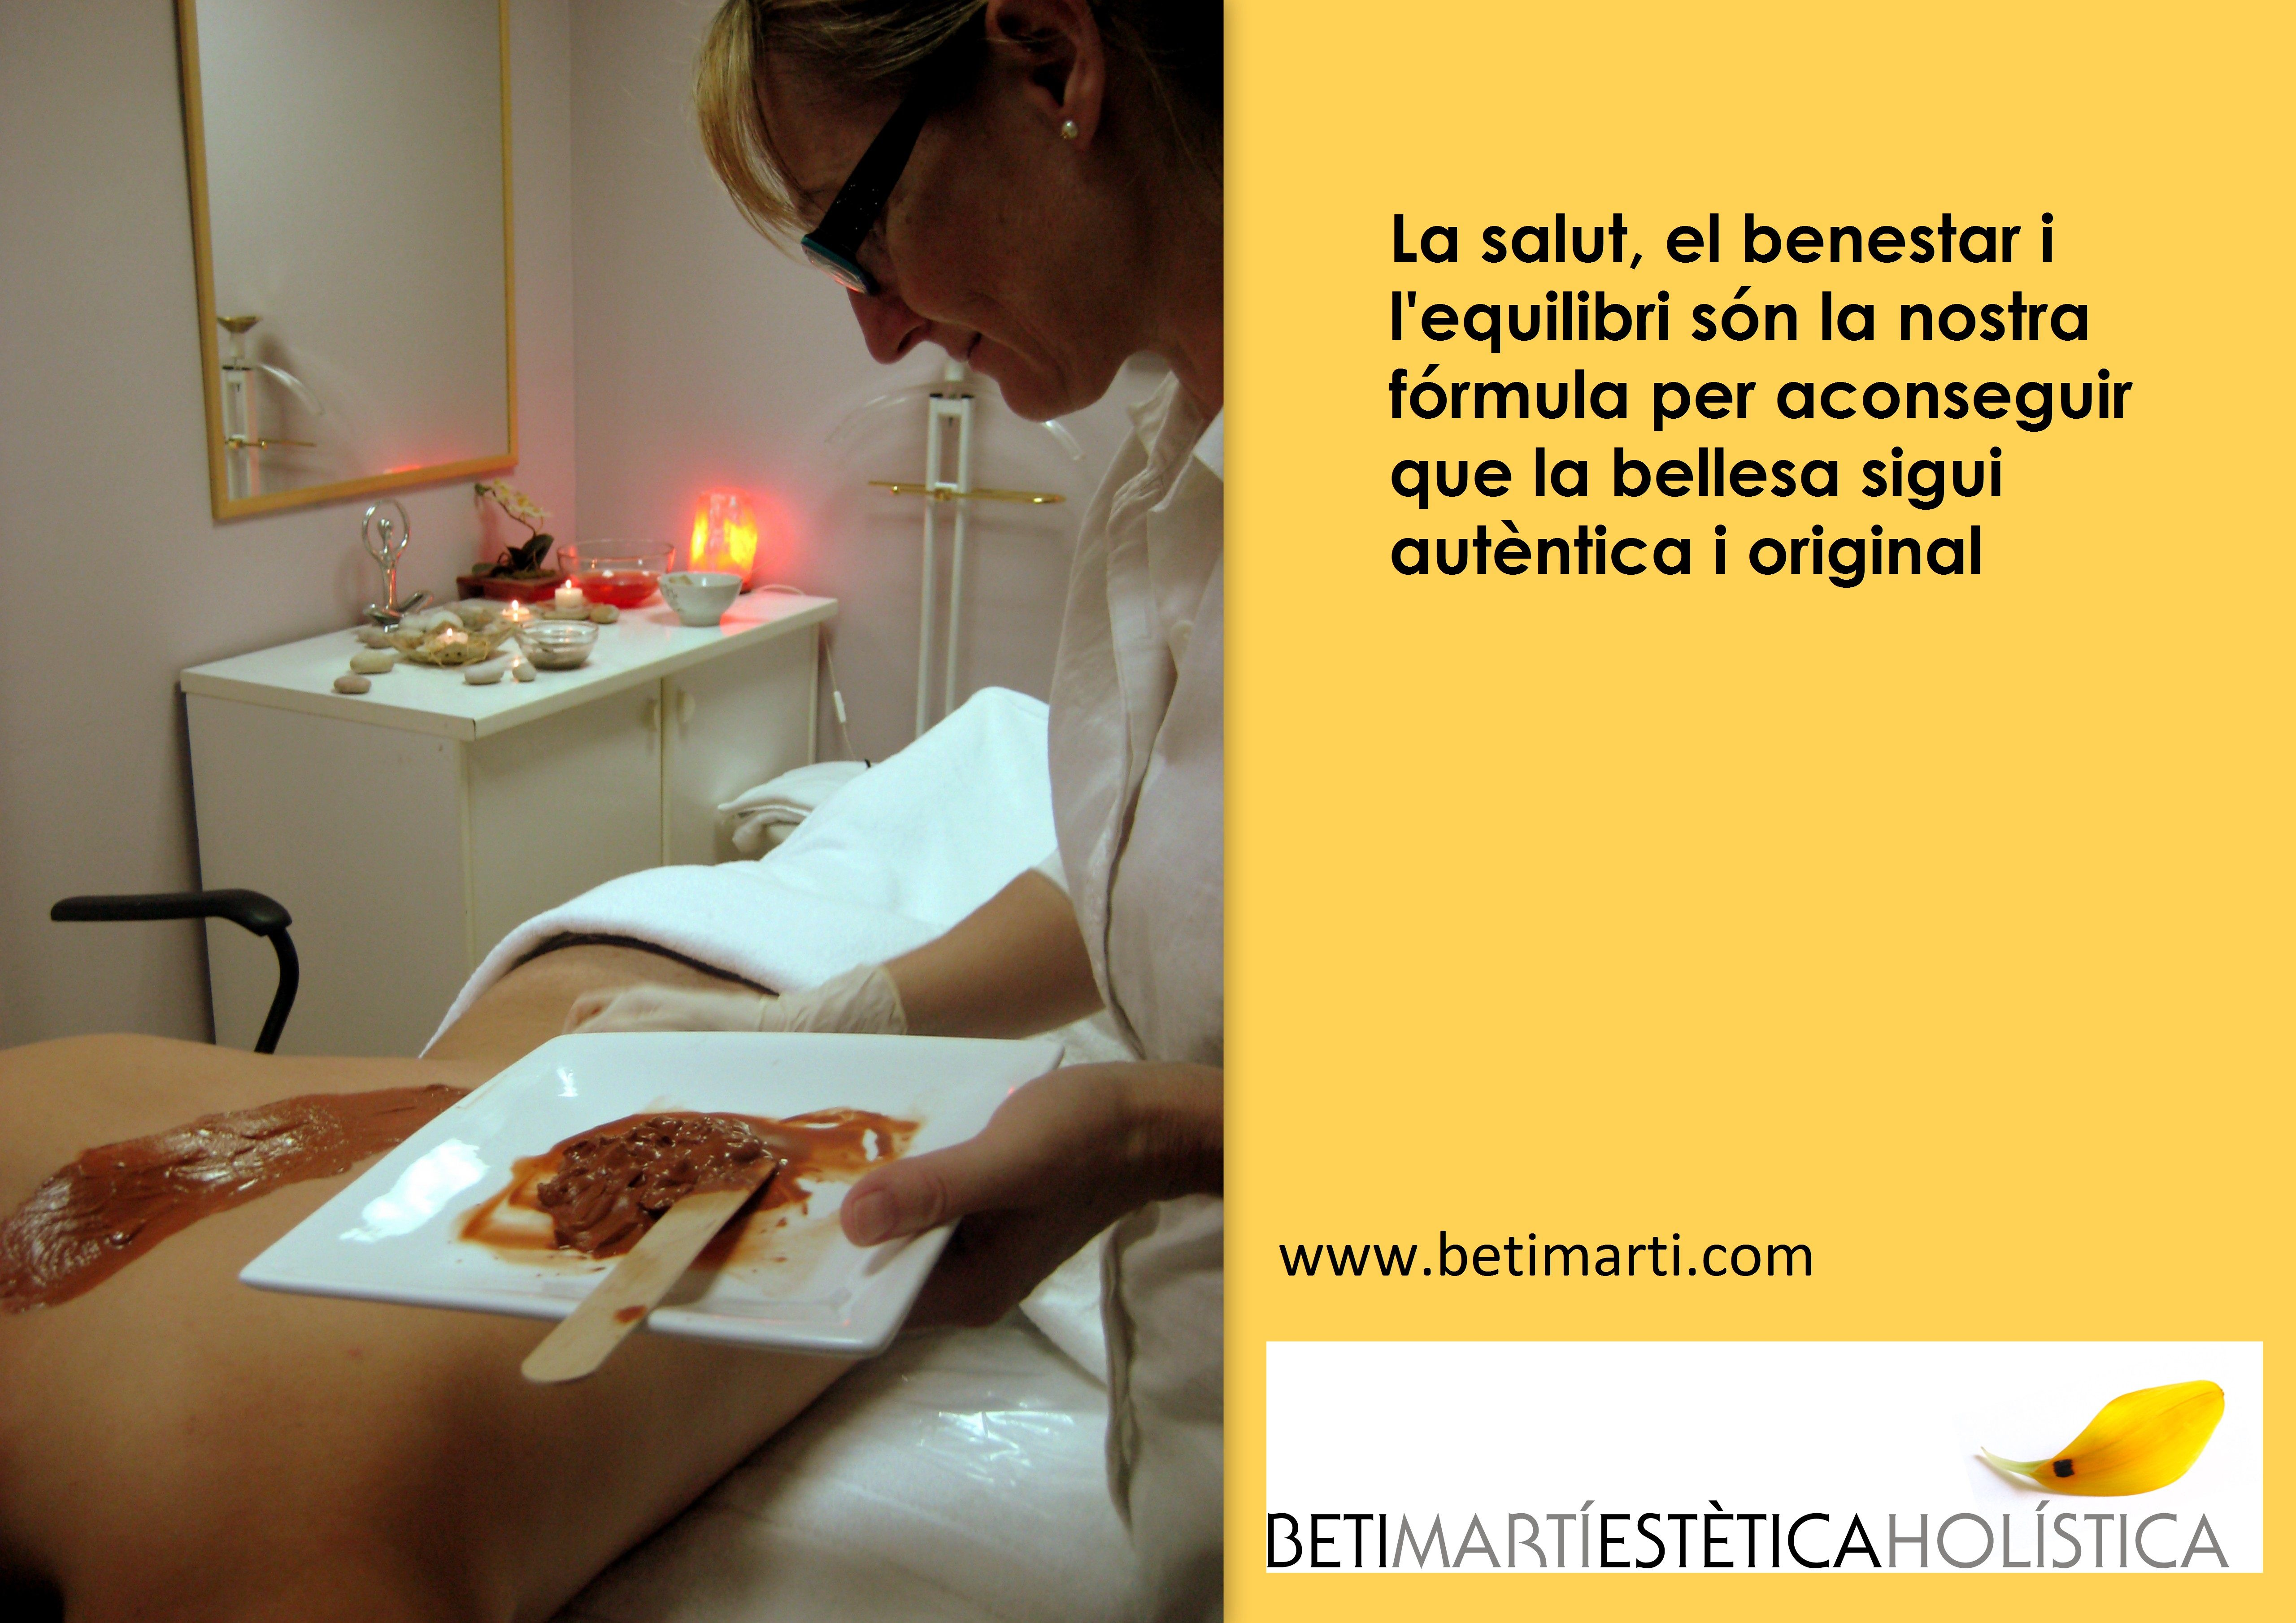 Salut, benestar i equilibri, T'apuntes? #betimartiesteticaholistica #salou #salut #benestar #equilibri